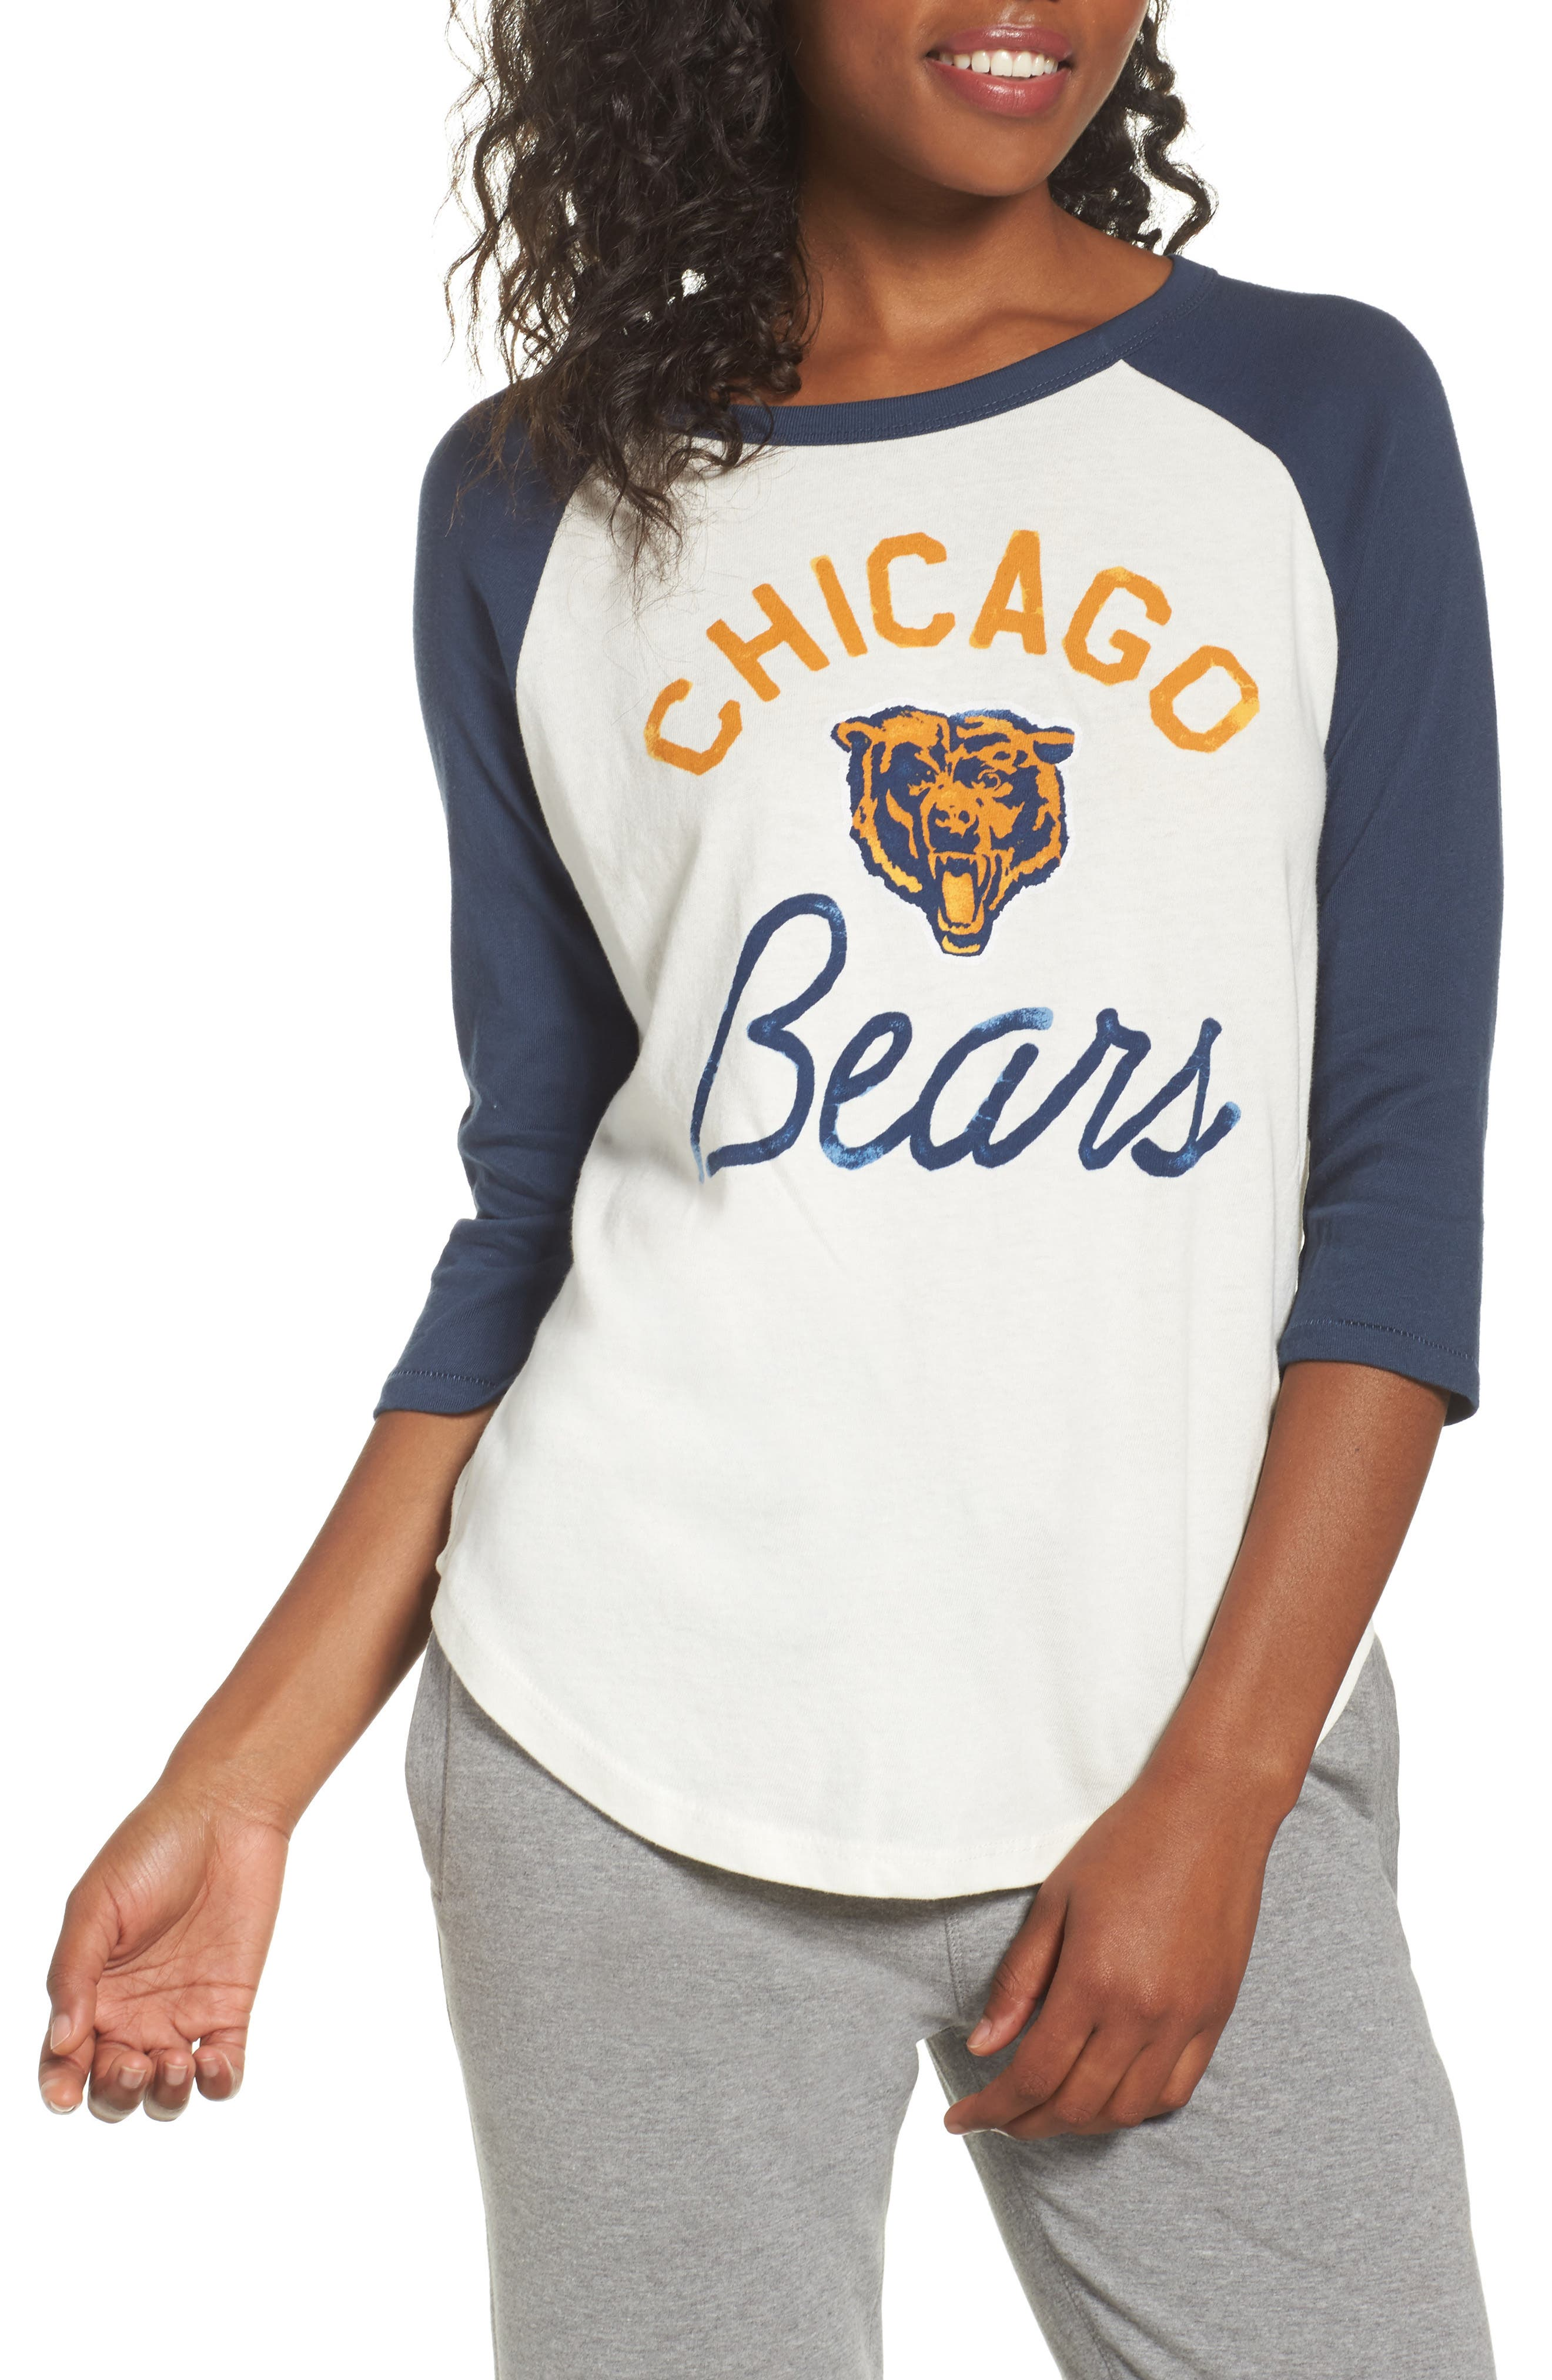 Junk Food NFL Chicago Bears Raglan Tee